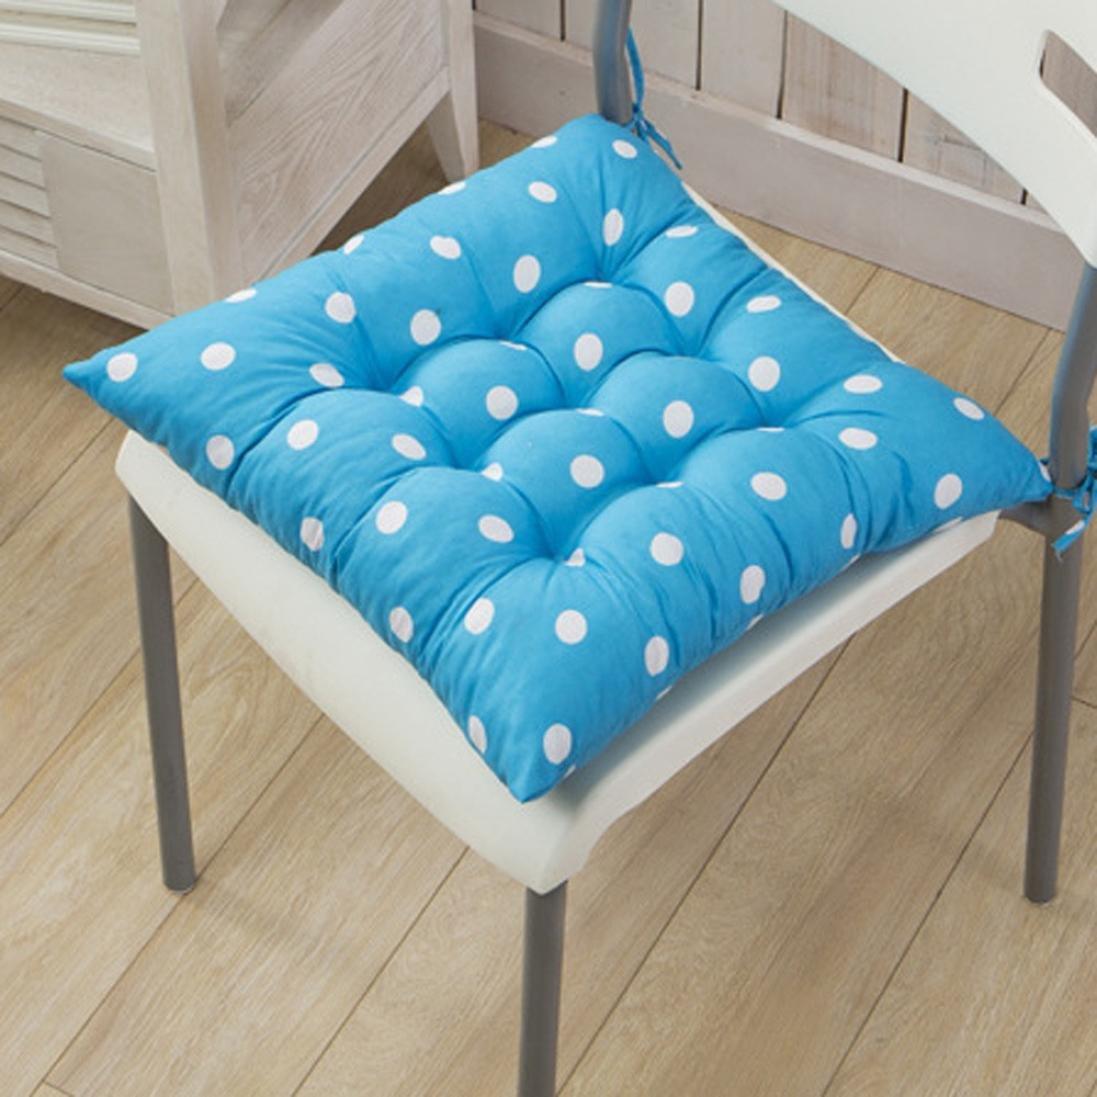 Chairs Cushion,Allywit Soft Chair Cushion Dots Pattern Home Fashions Outdoor Seat Back Chair Cushion (D)